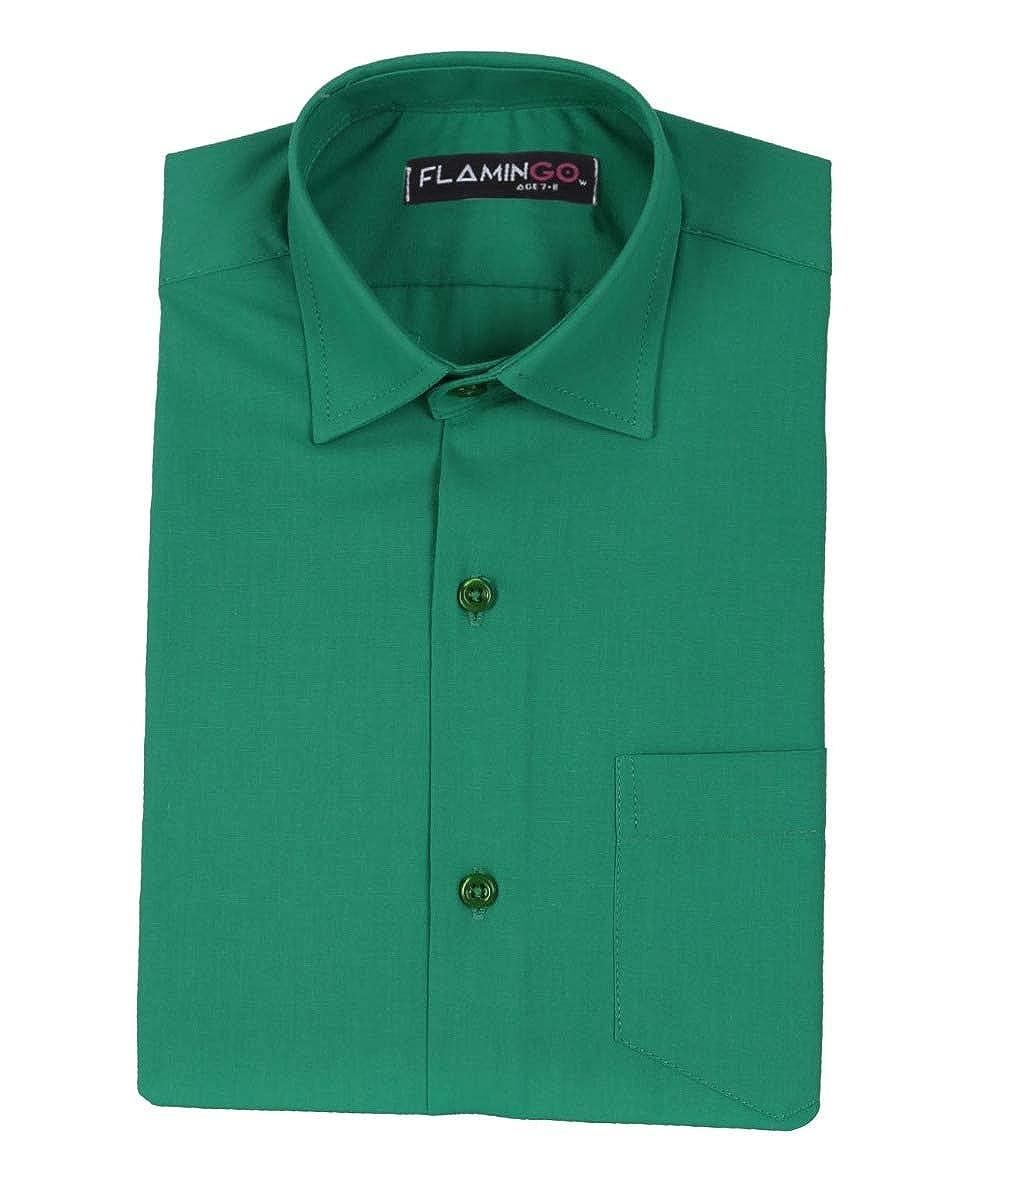 Boys Kids Cotton Slim Fit Classic Formal Dark Green Shirt